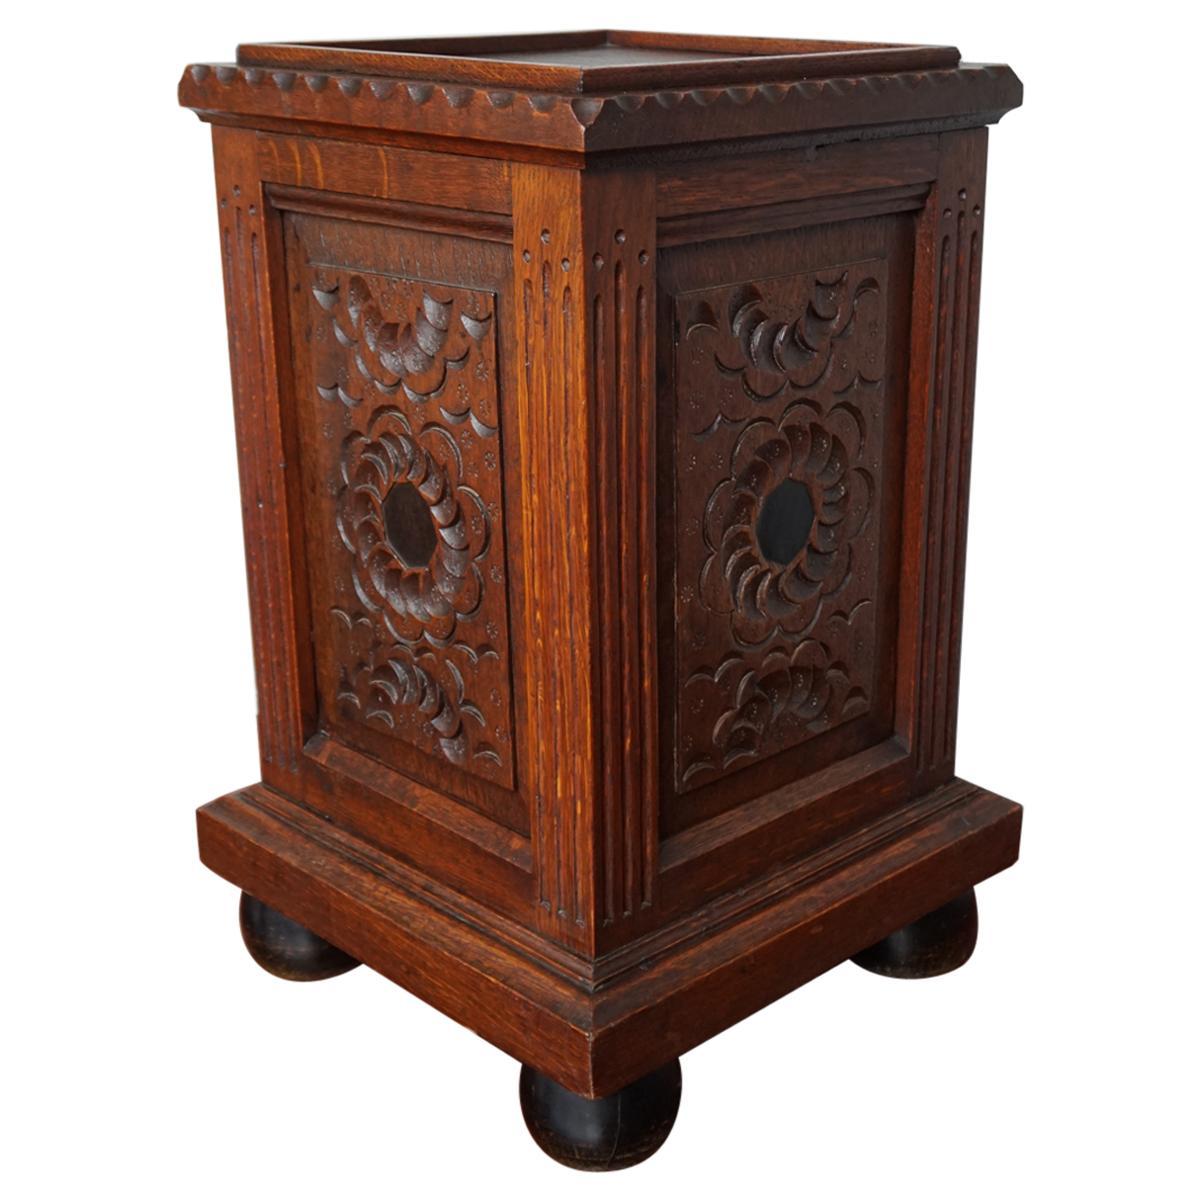 Antique Hand Carved & Inlaid Renaissance Revival Solid Oak Floor Pedestal Stand